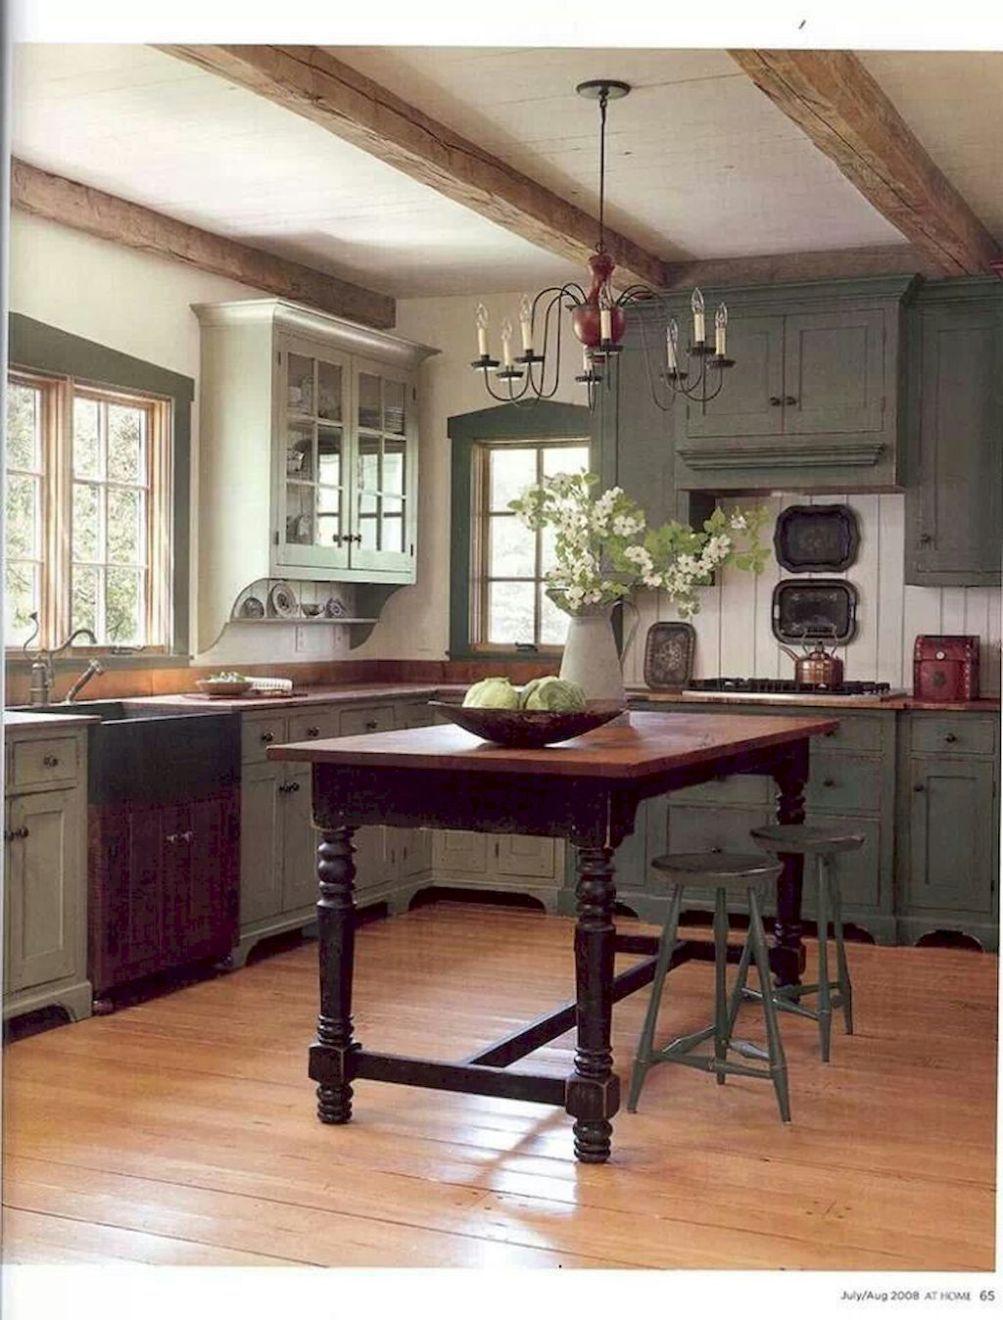 farmhouse kitchen cabinets decorating ideas on a budget 38 kitchen ideas cottage kitchen. Black Bedroom Furniture Sets. Home Design Ideas